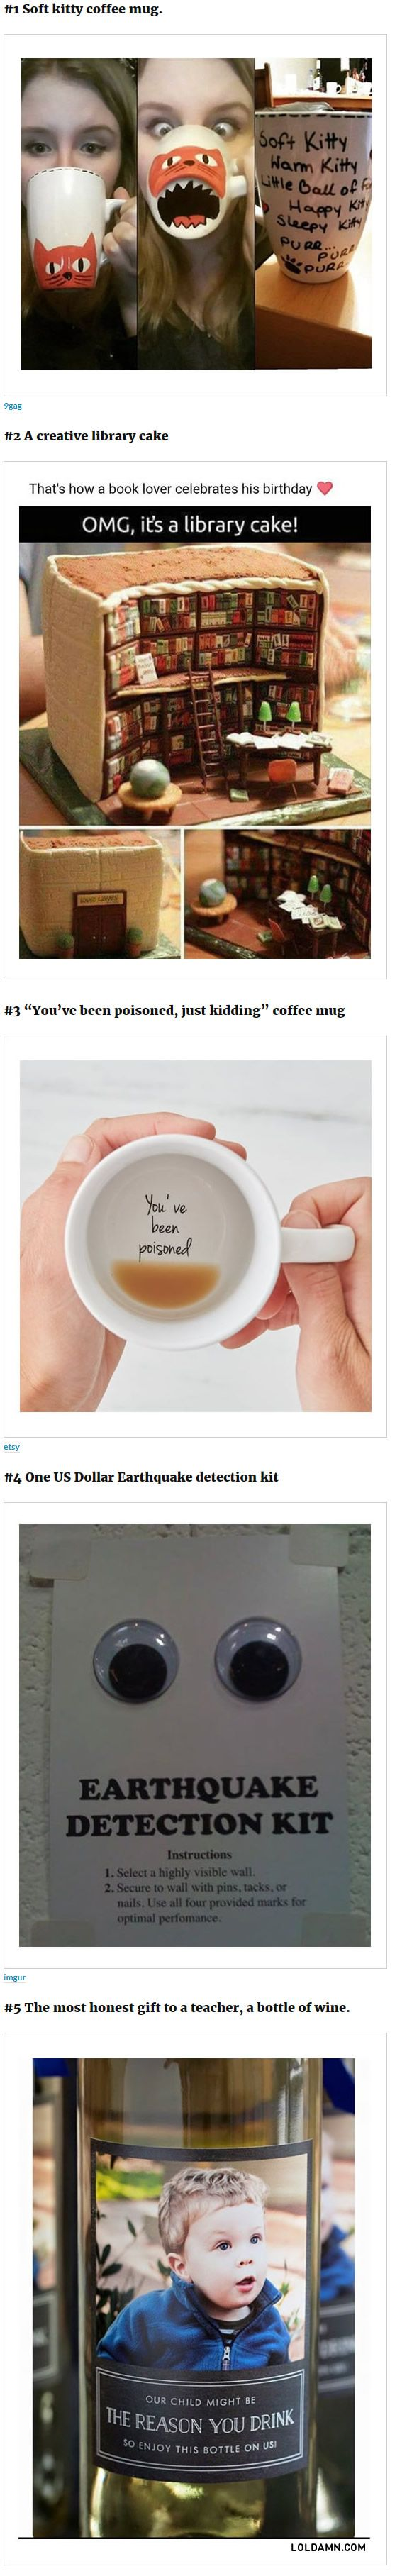 Best 25 Funny mugs ideas on Pinterest